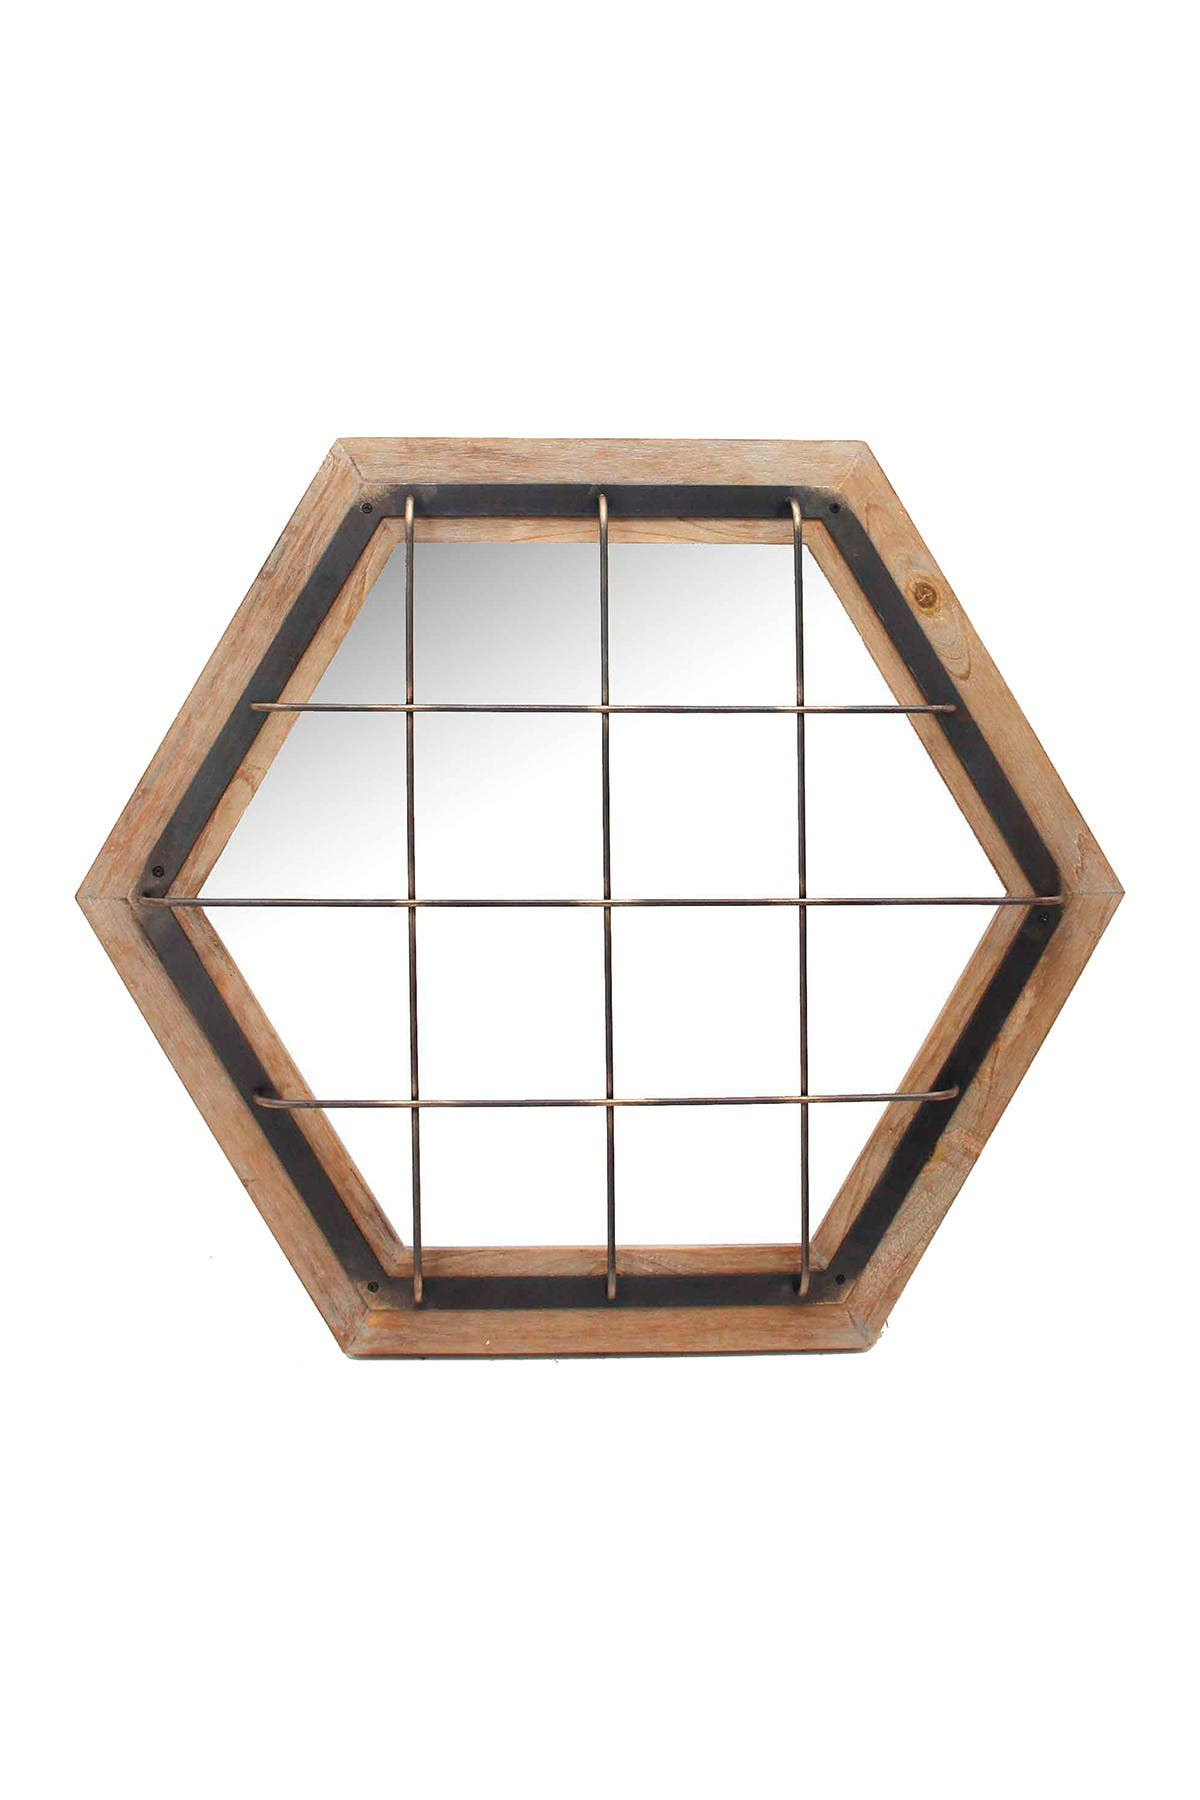 Image of SAGEBROOK HOME Brown Caged Hexagon Wood Mirror